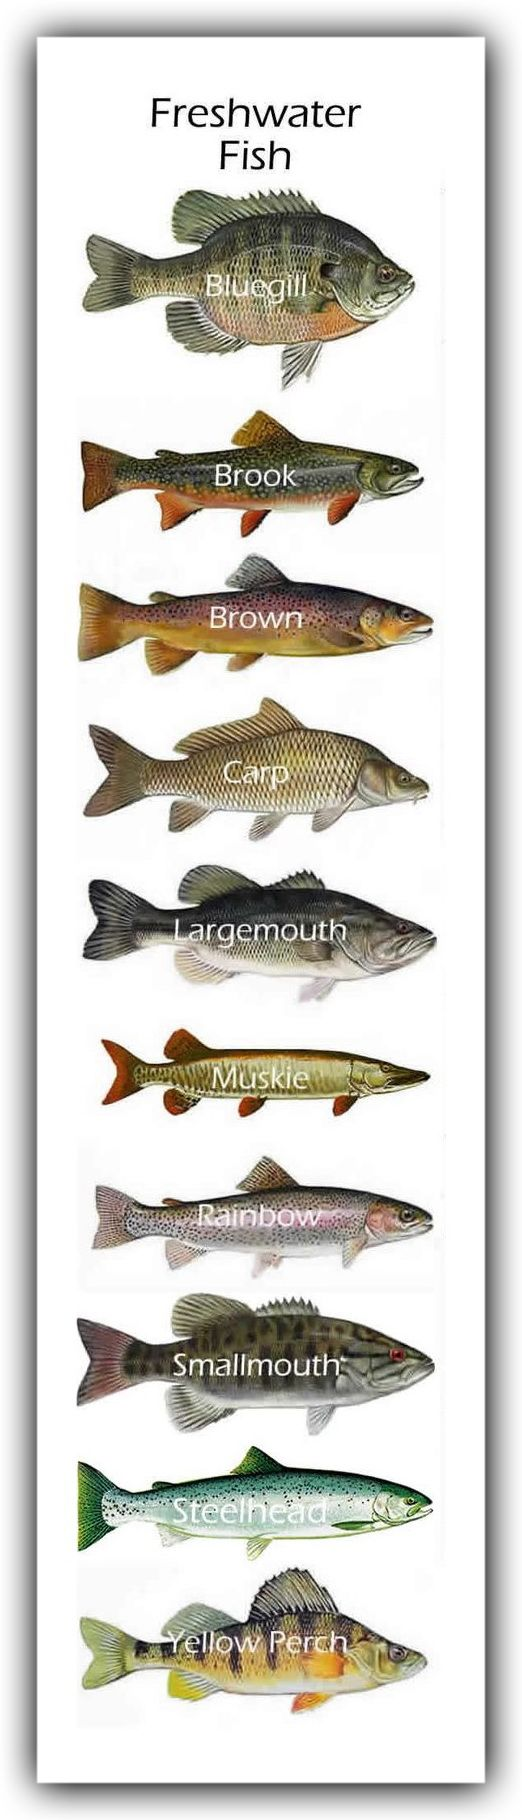 Freshwater fish jigsaw puzzles - Freshwater Fish